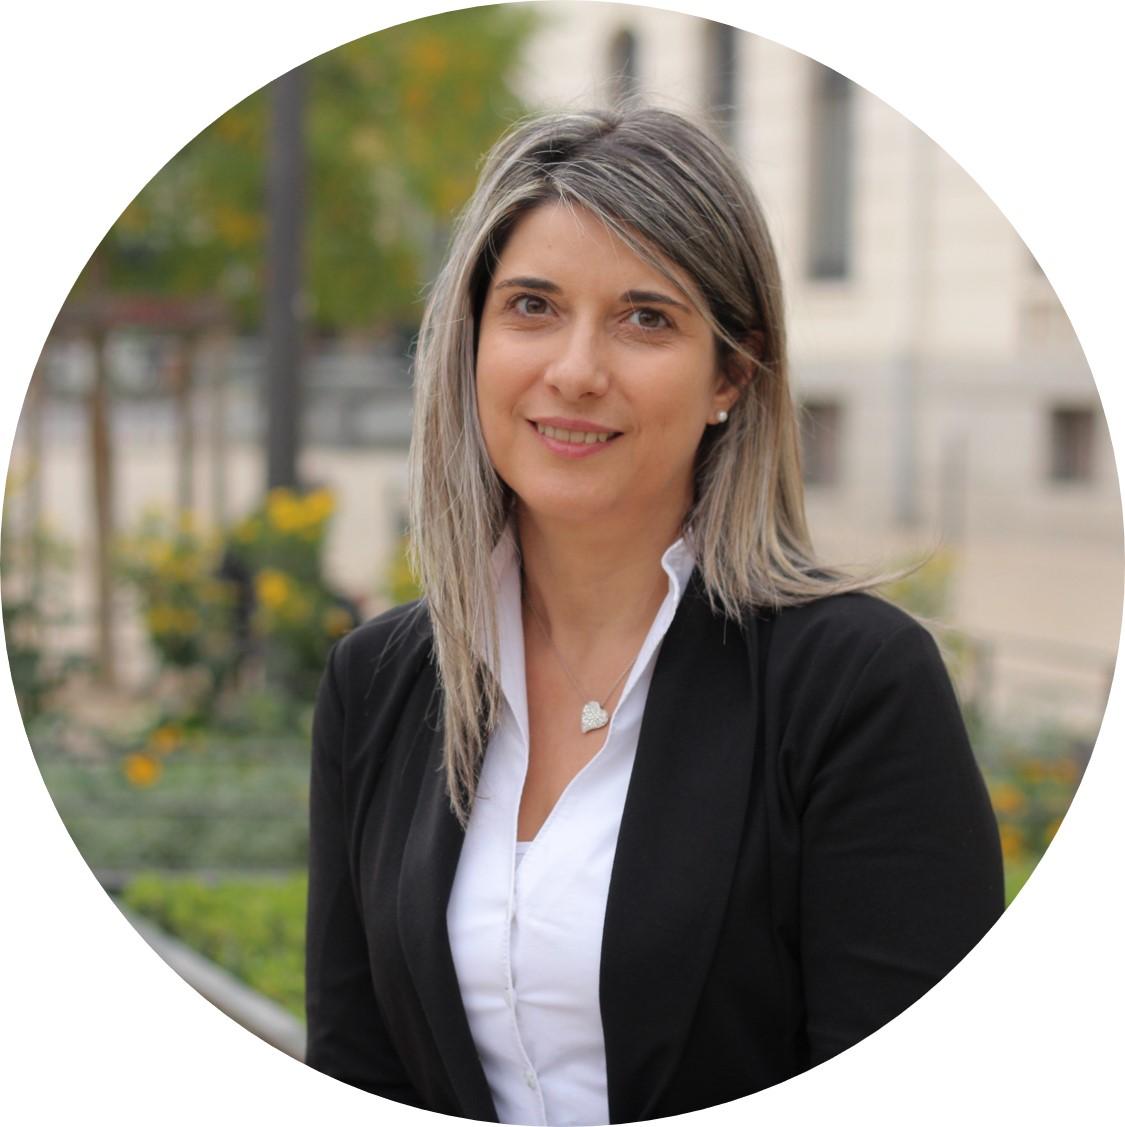 Marie Costa